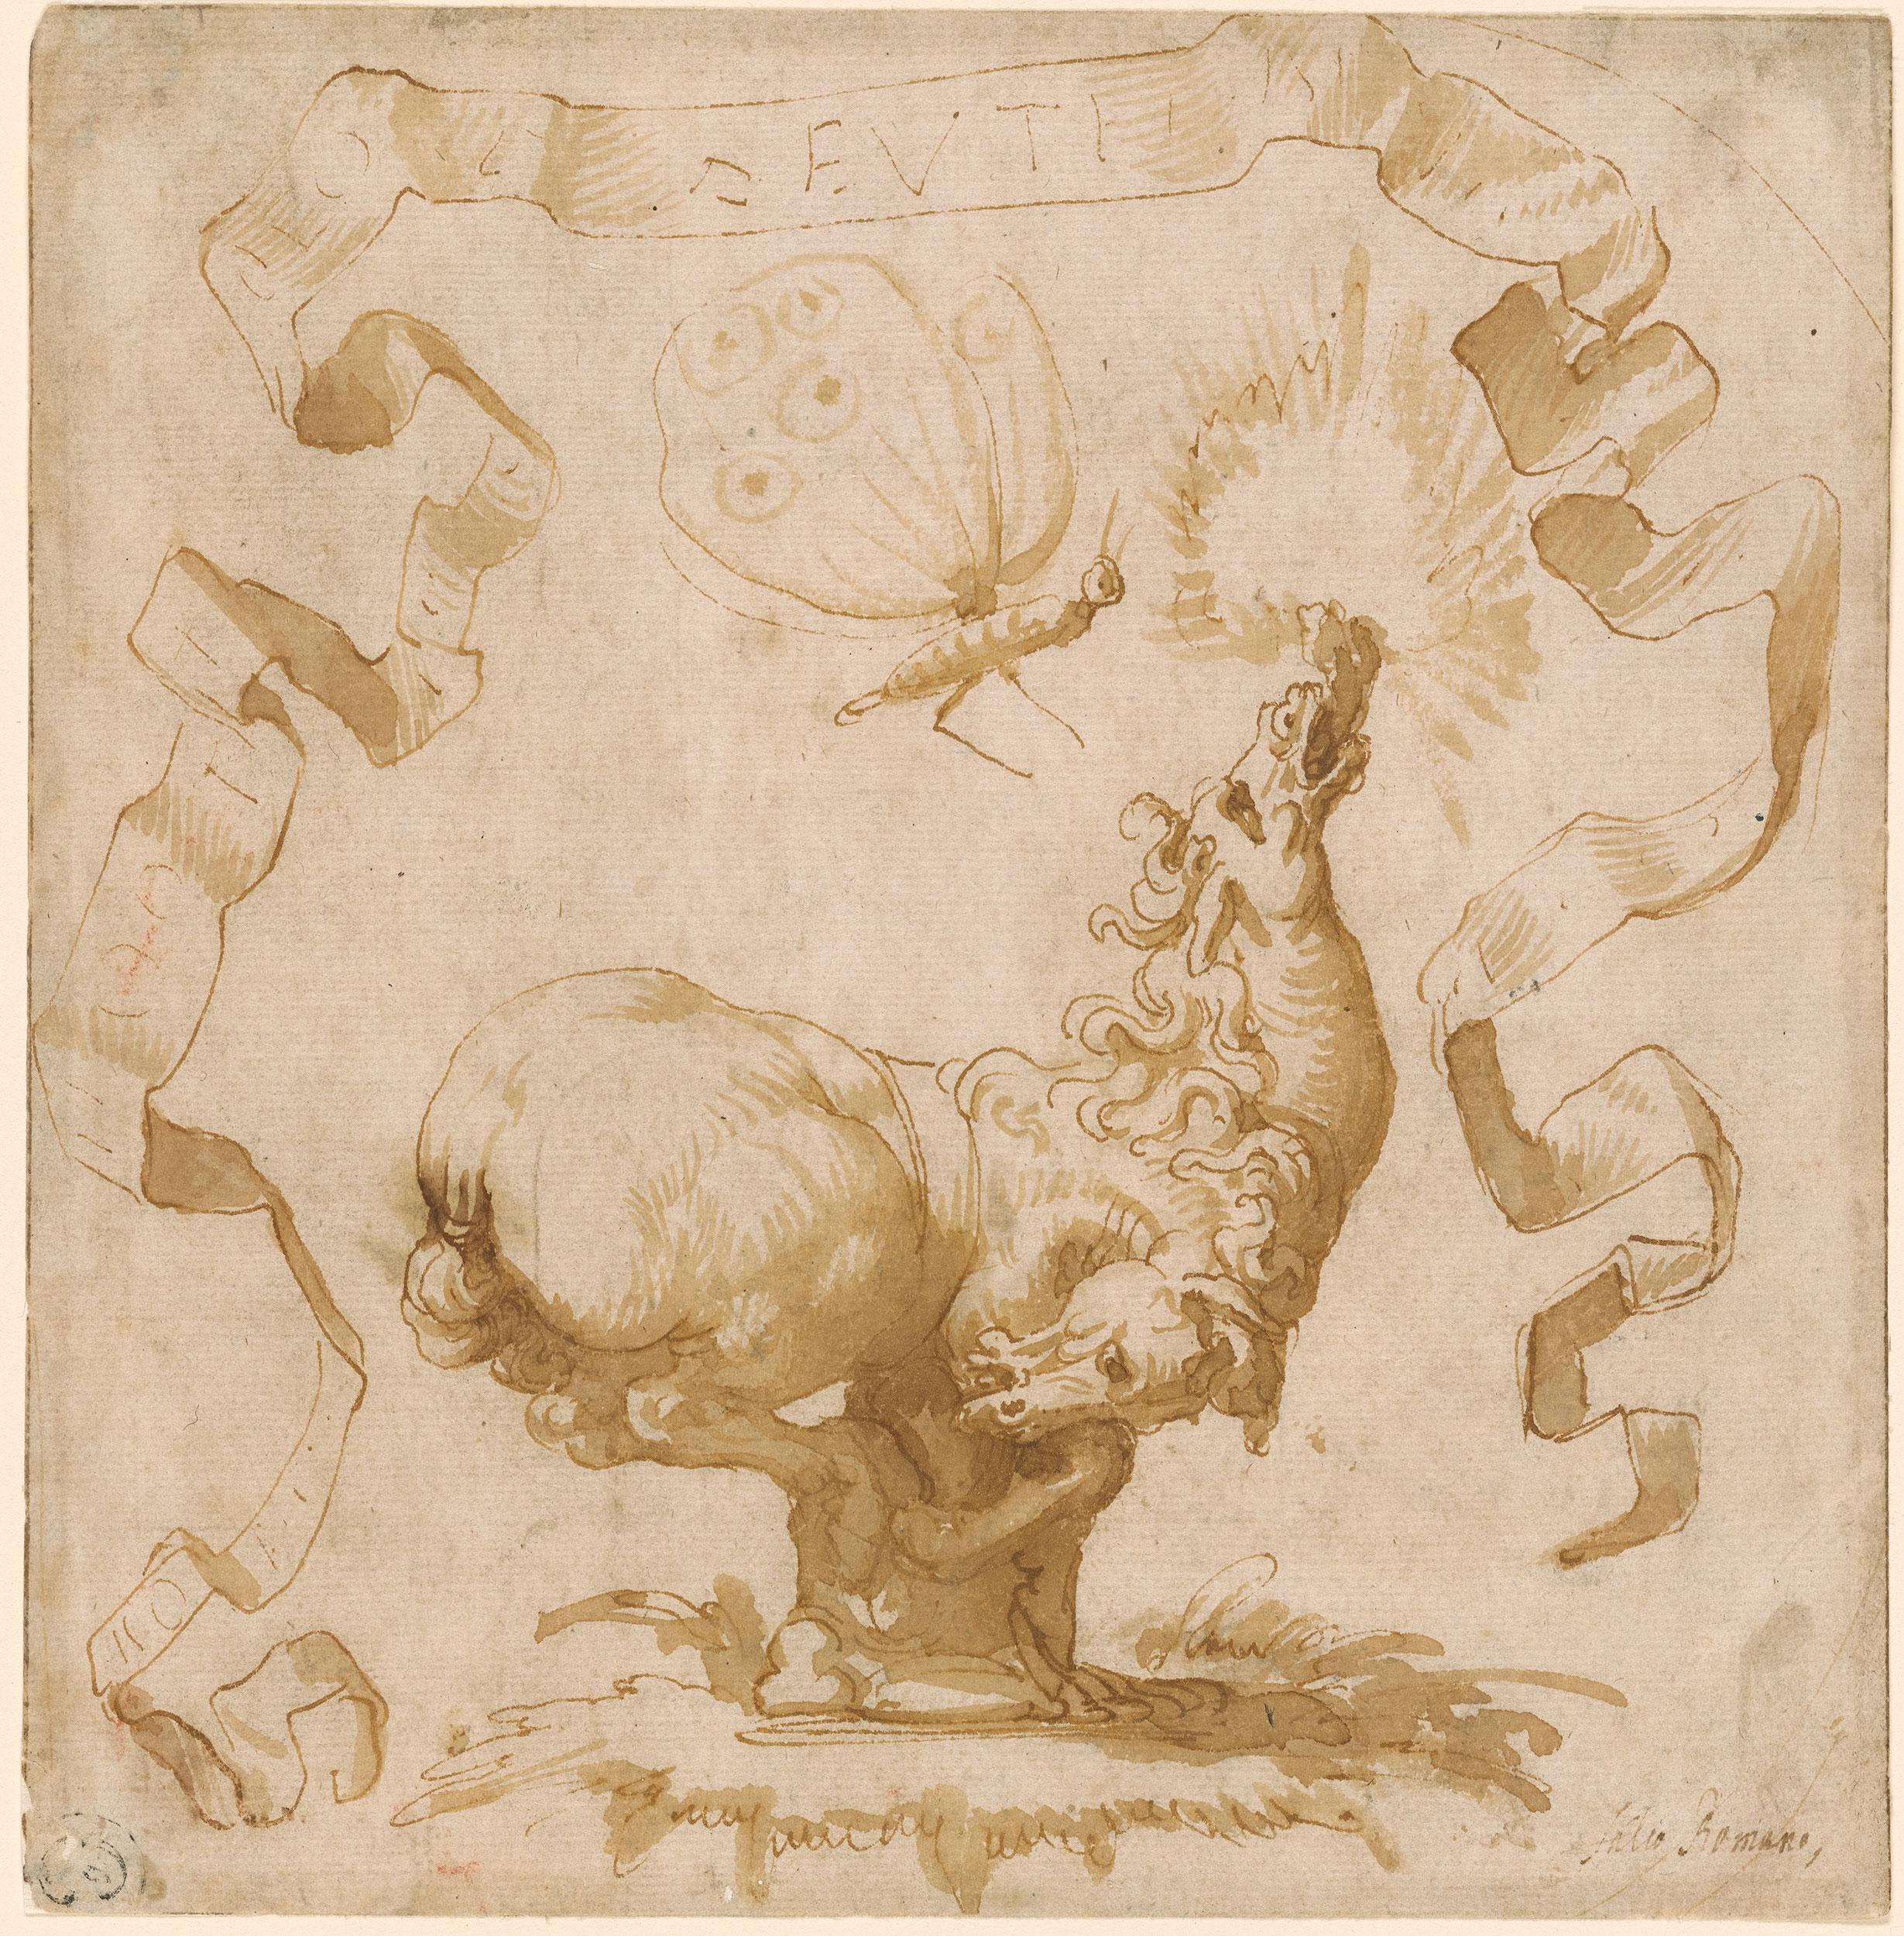 Francesco Salviati Drawings 142648v_0001.jpg Francesco